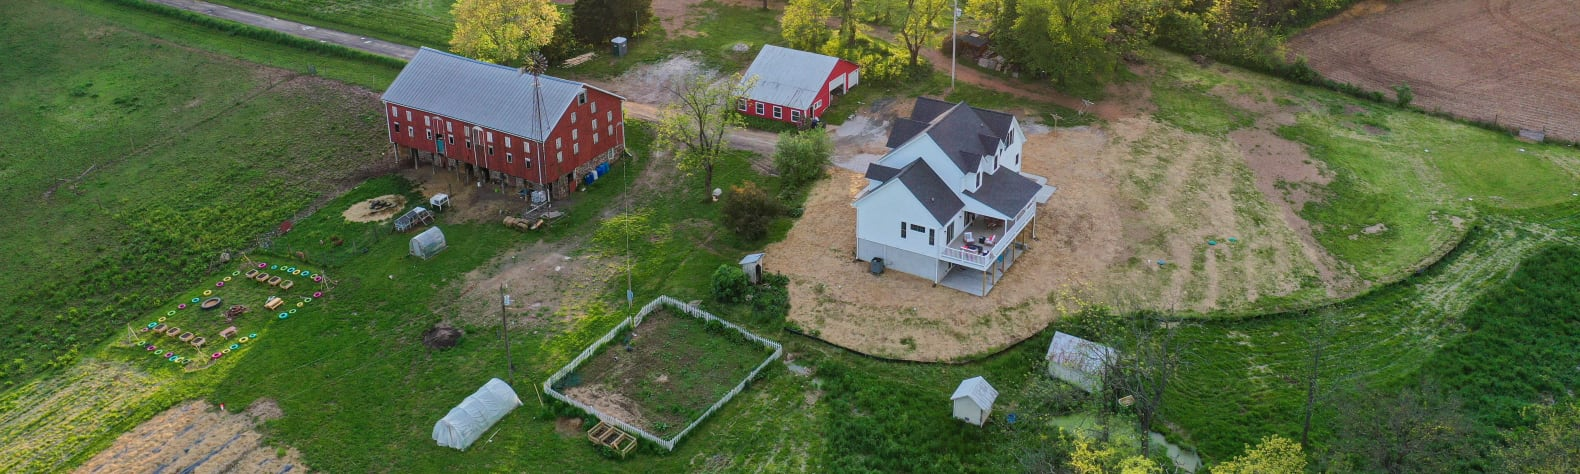 Willet Family Farm